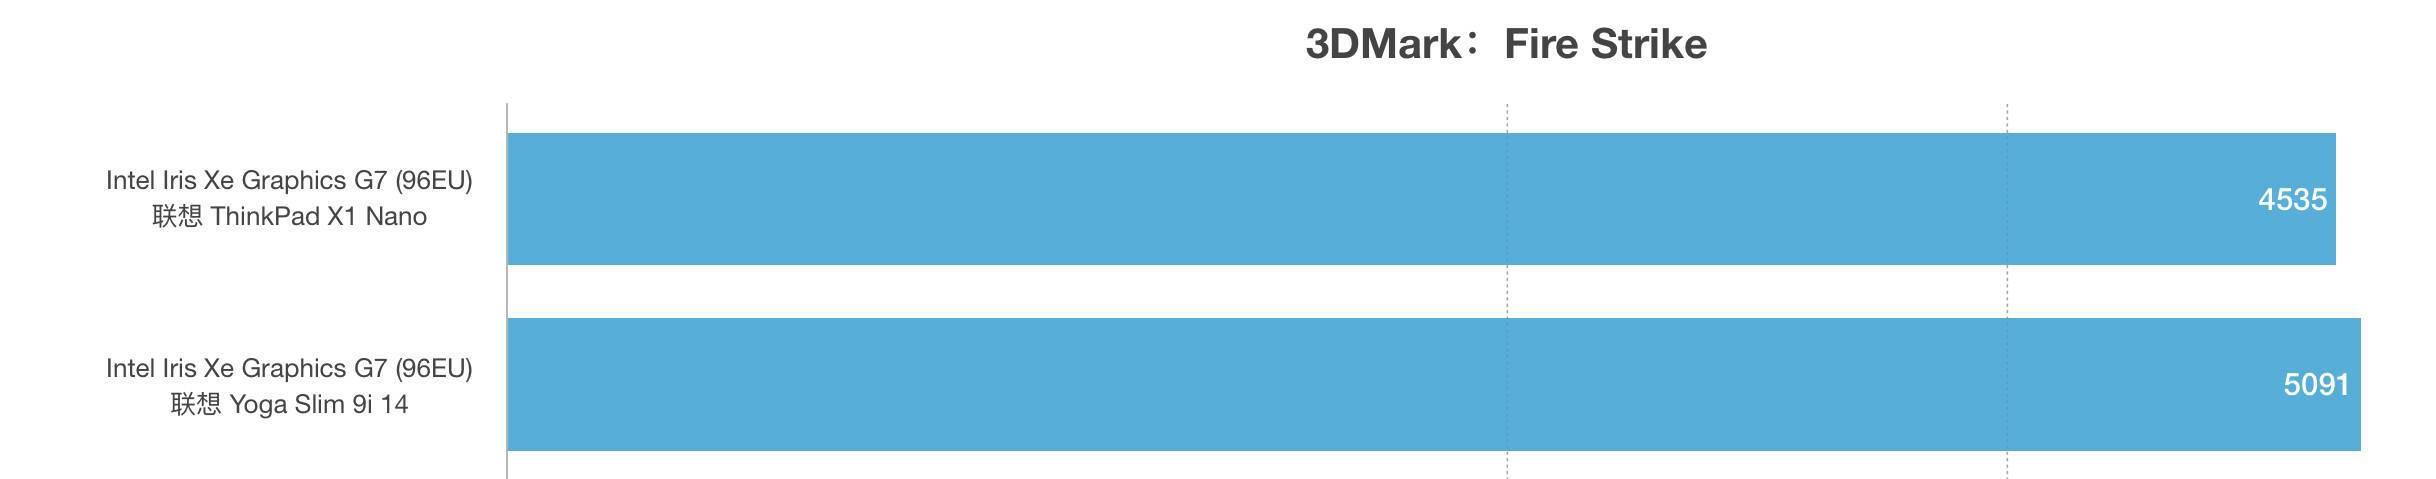 Intel Core i7-1160G7和i7-1165G7性能跑分对比评测